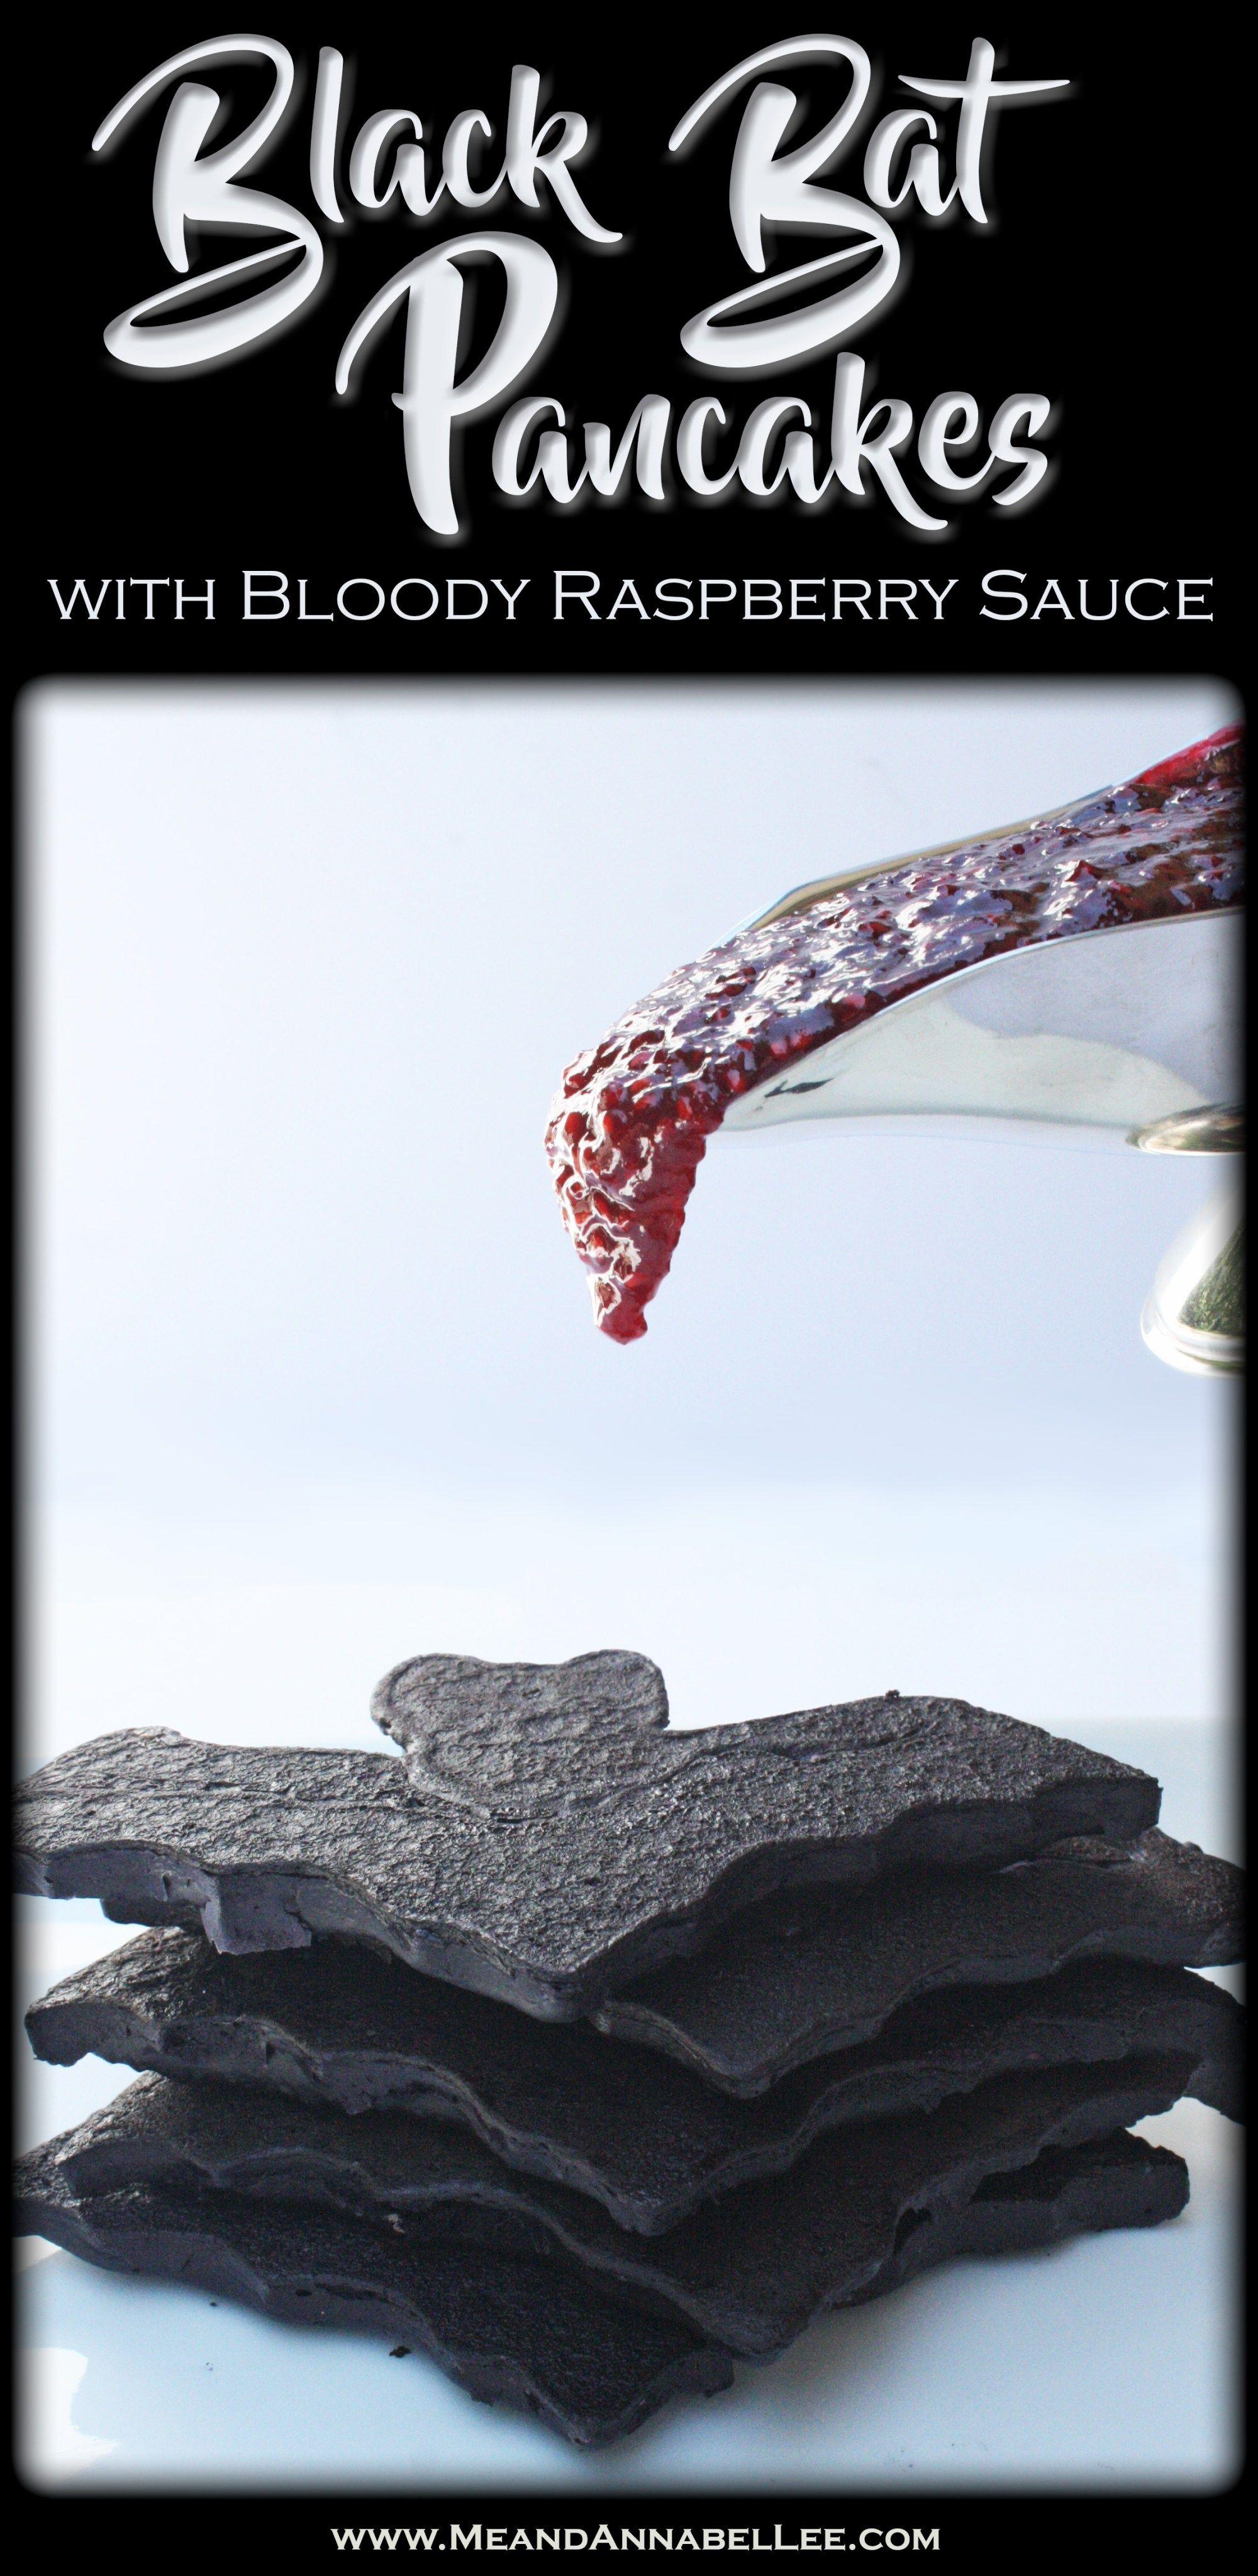 Black Bat Pancakes Raspberry Sauce Recipes Vampire Pancake Mold Goth Baking Www Meandannabellee